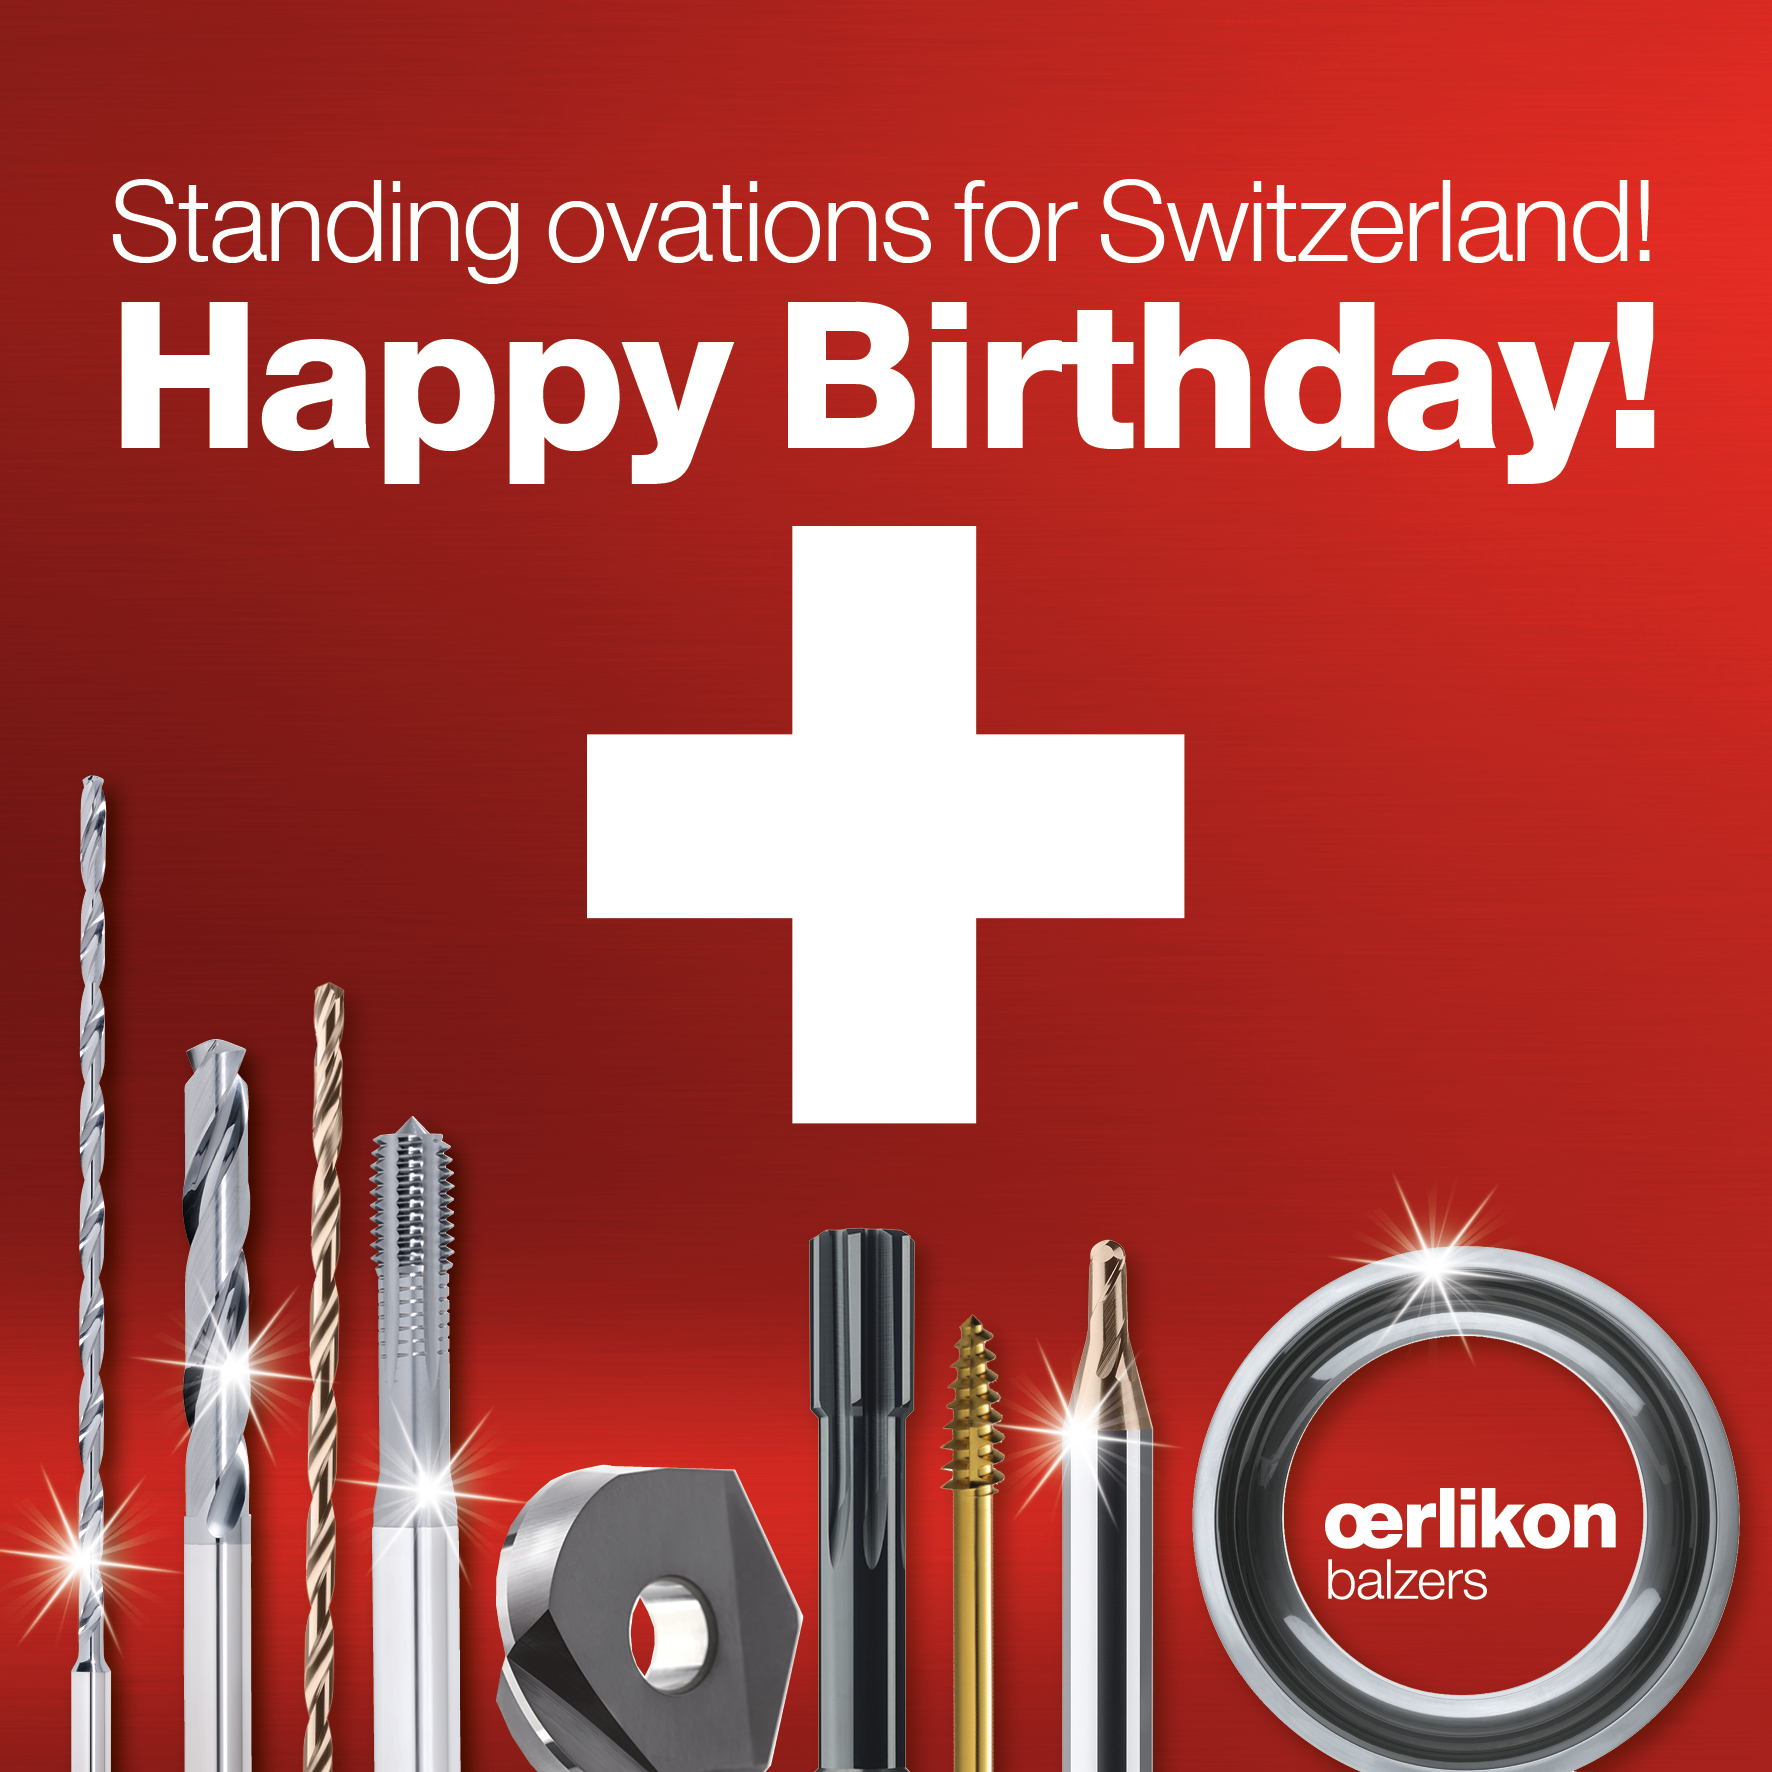 Oerlikon Balzers - Facebook Ad 3 - Nationalfeiertag Schweiz